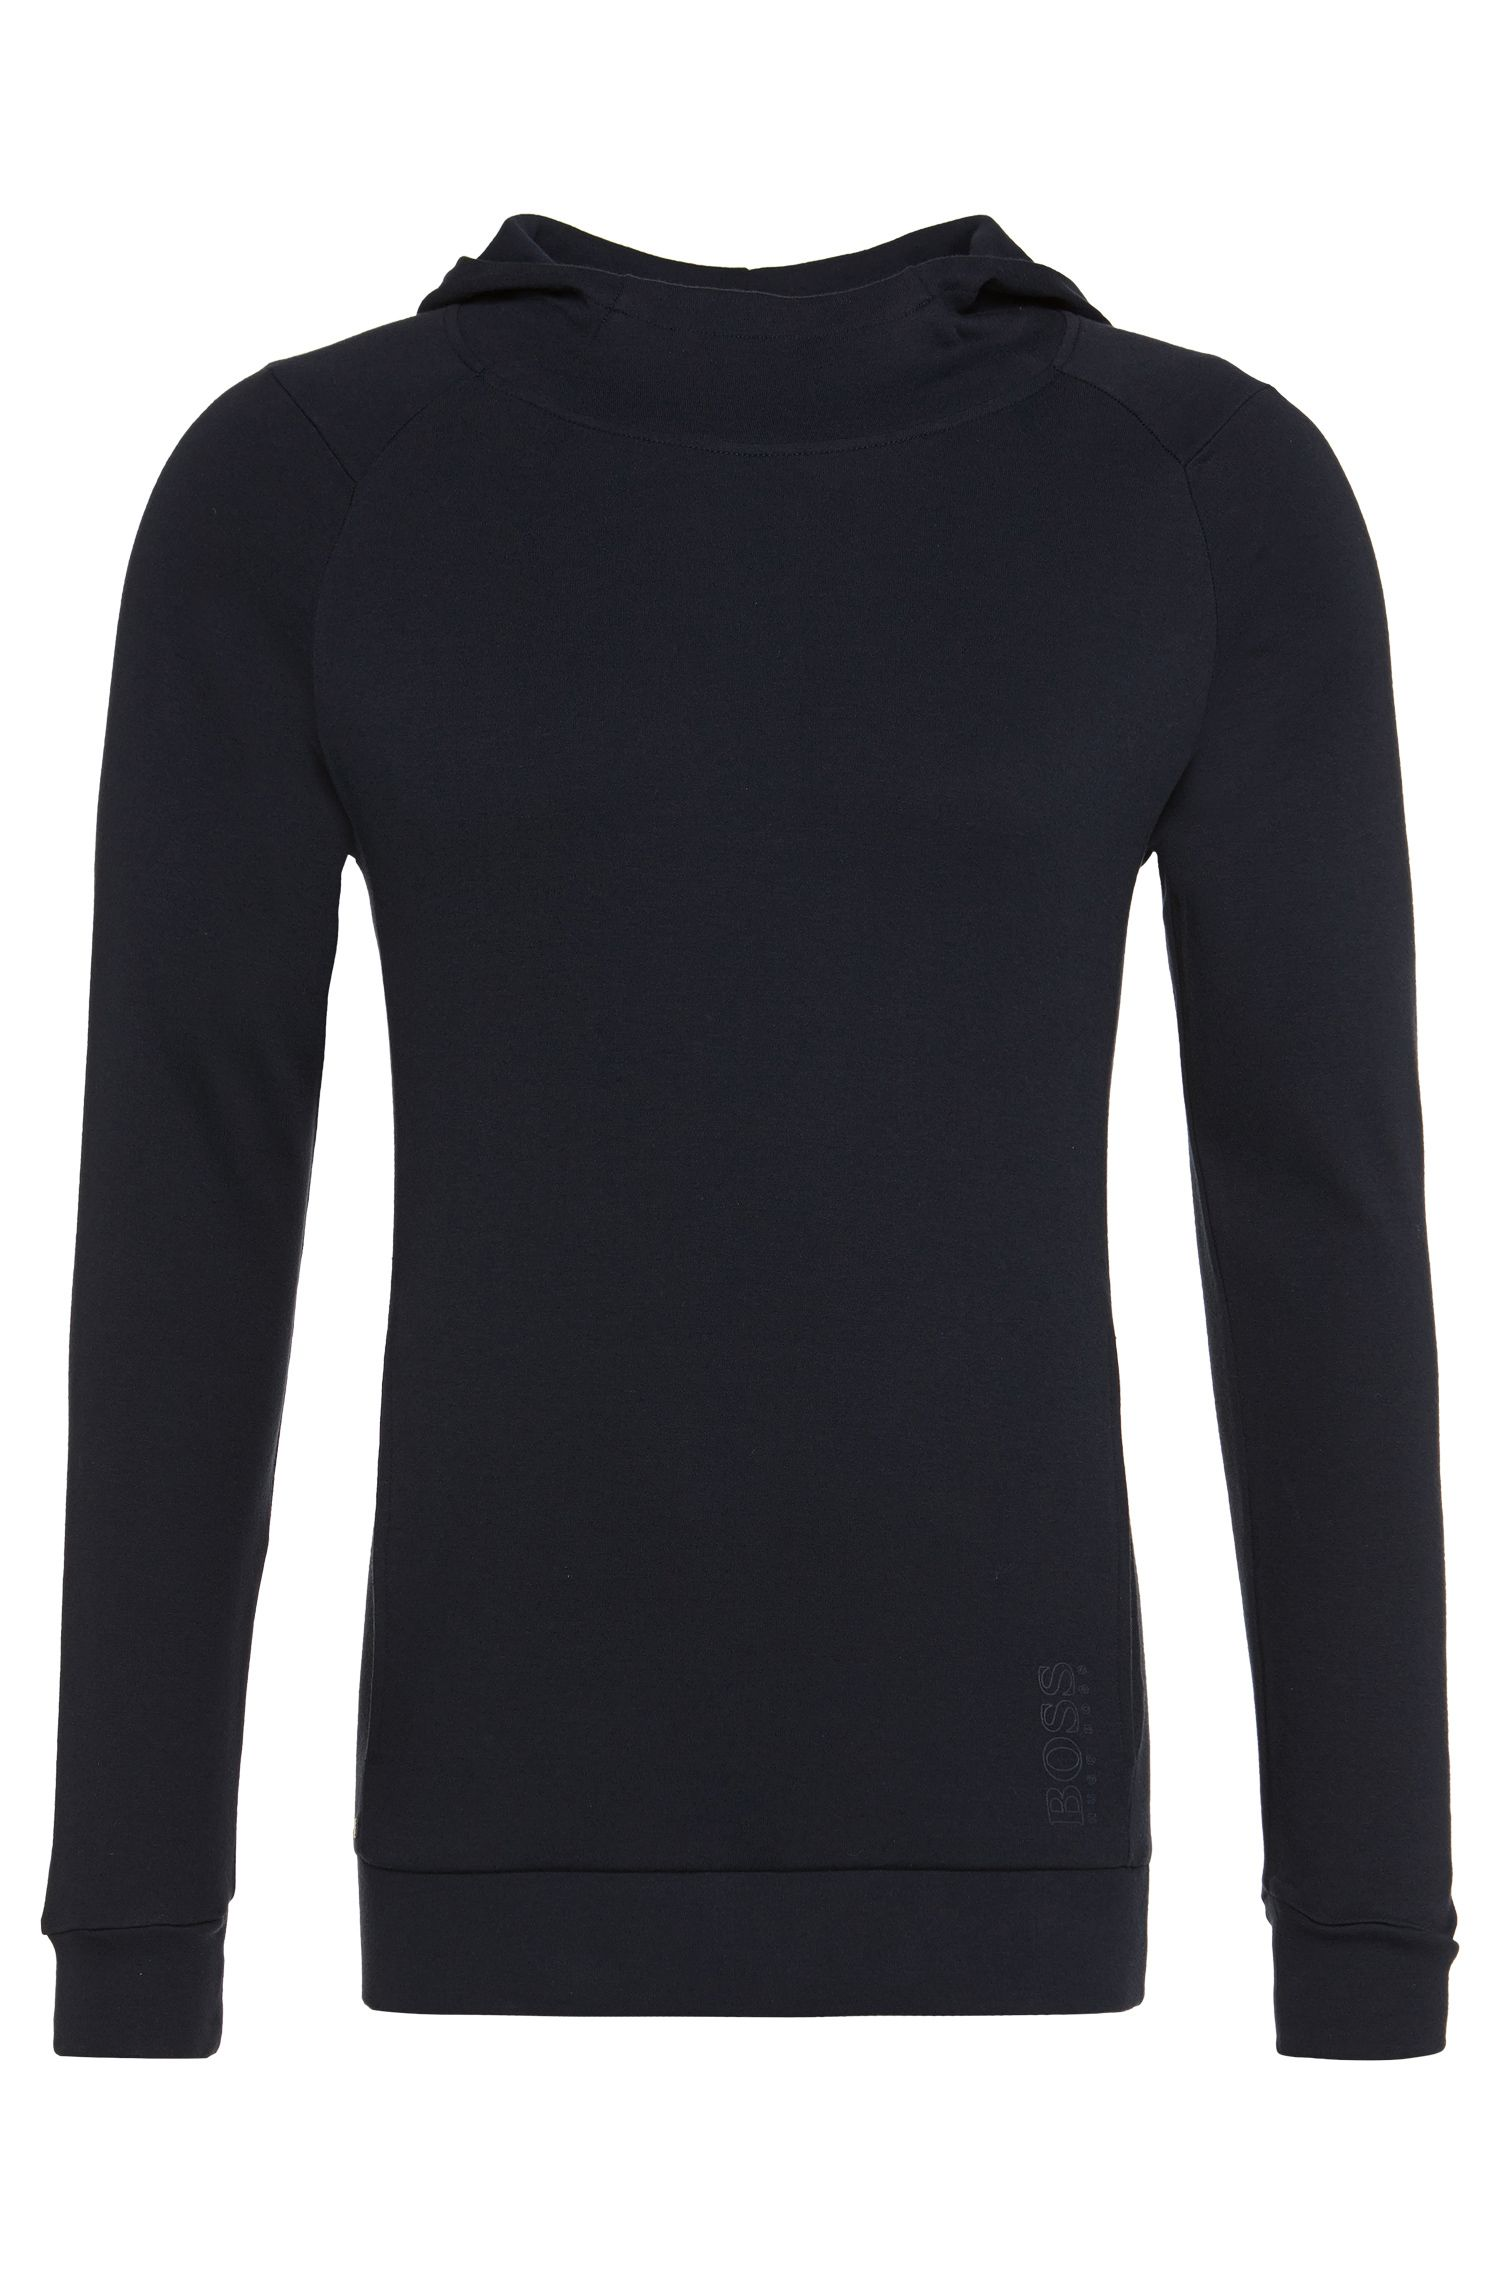 Sweatshirt van katoen: 'Shirt Hooded'